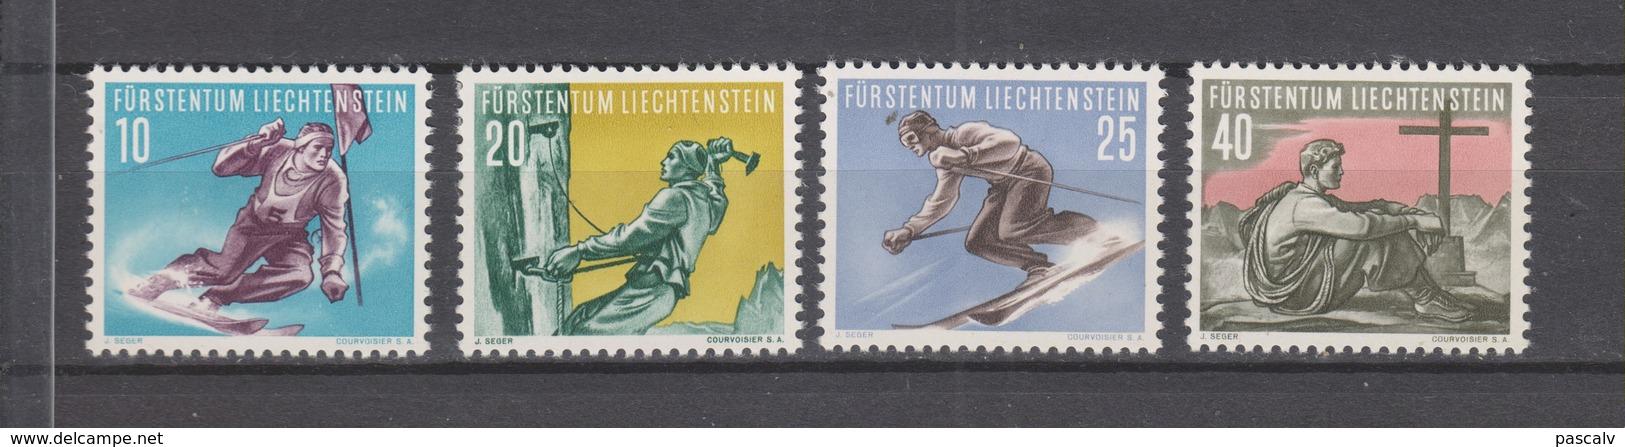 Yvert 296 / 299 * Neuf Avec Charnière Ski Alpinisme - Liechtenstein